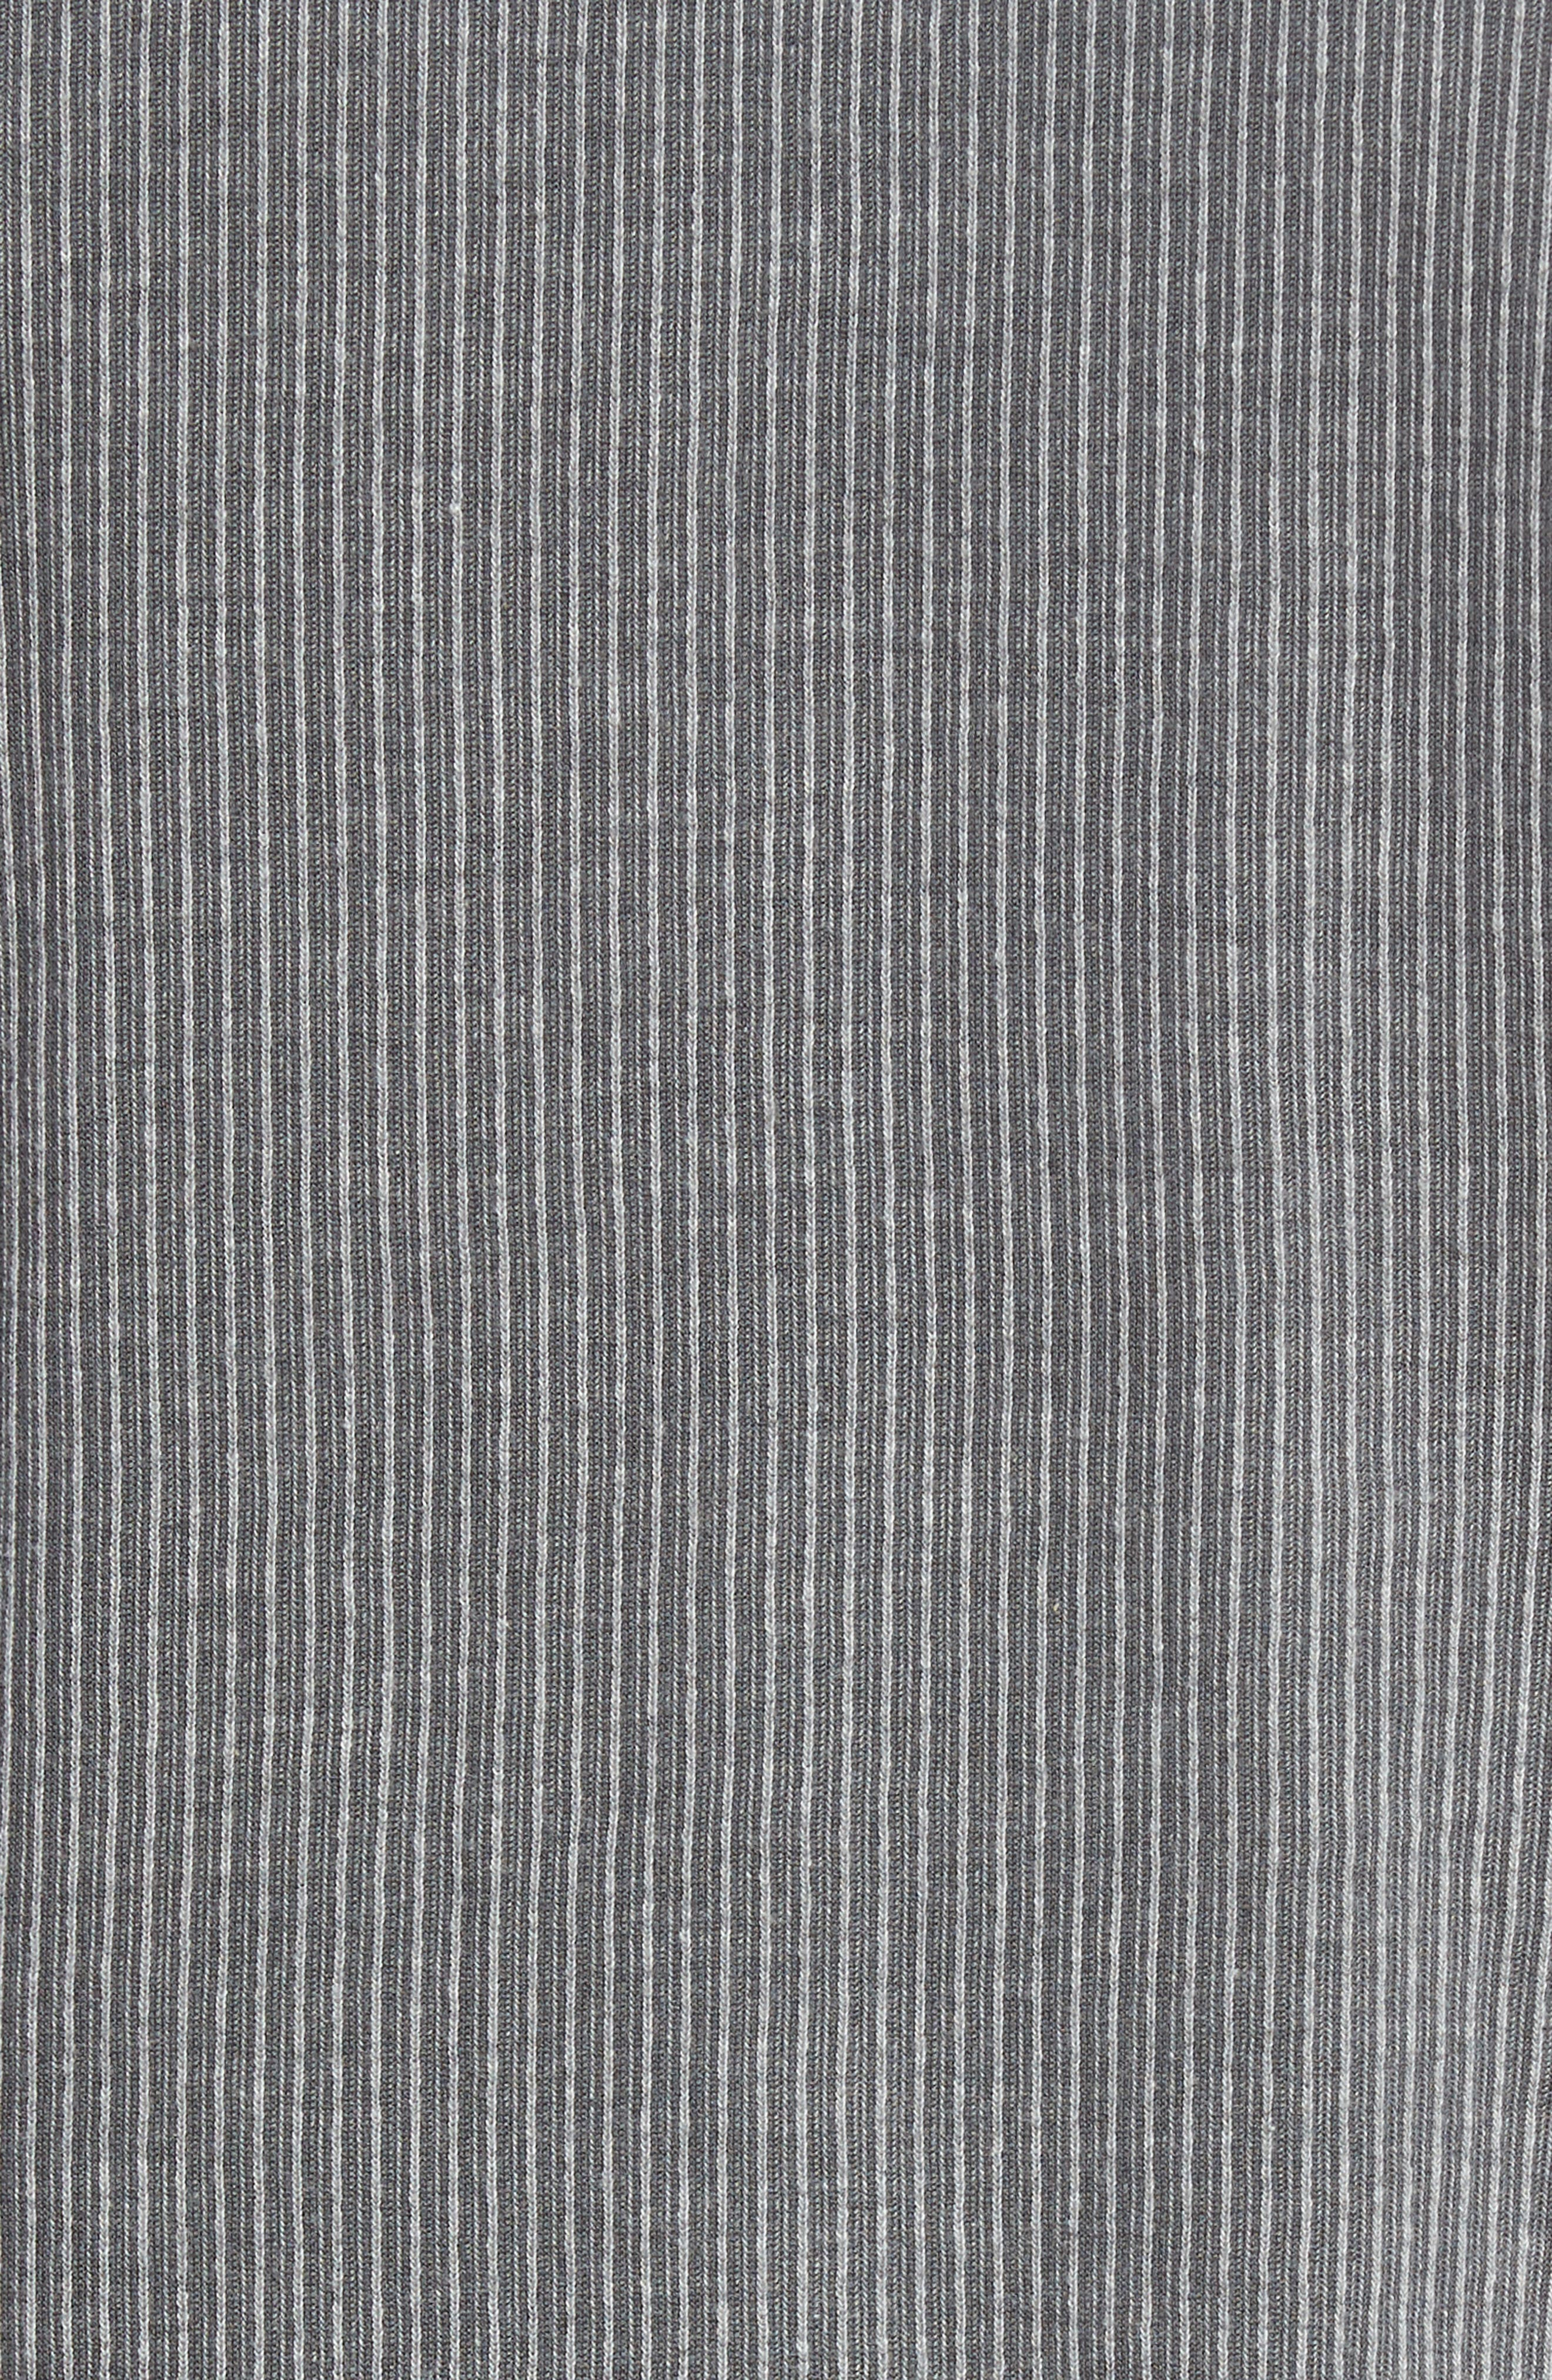 Stripe Henley,                             Alternate thumbnail 5, color,                             Dark Grey